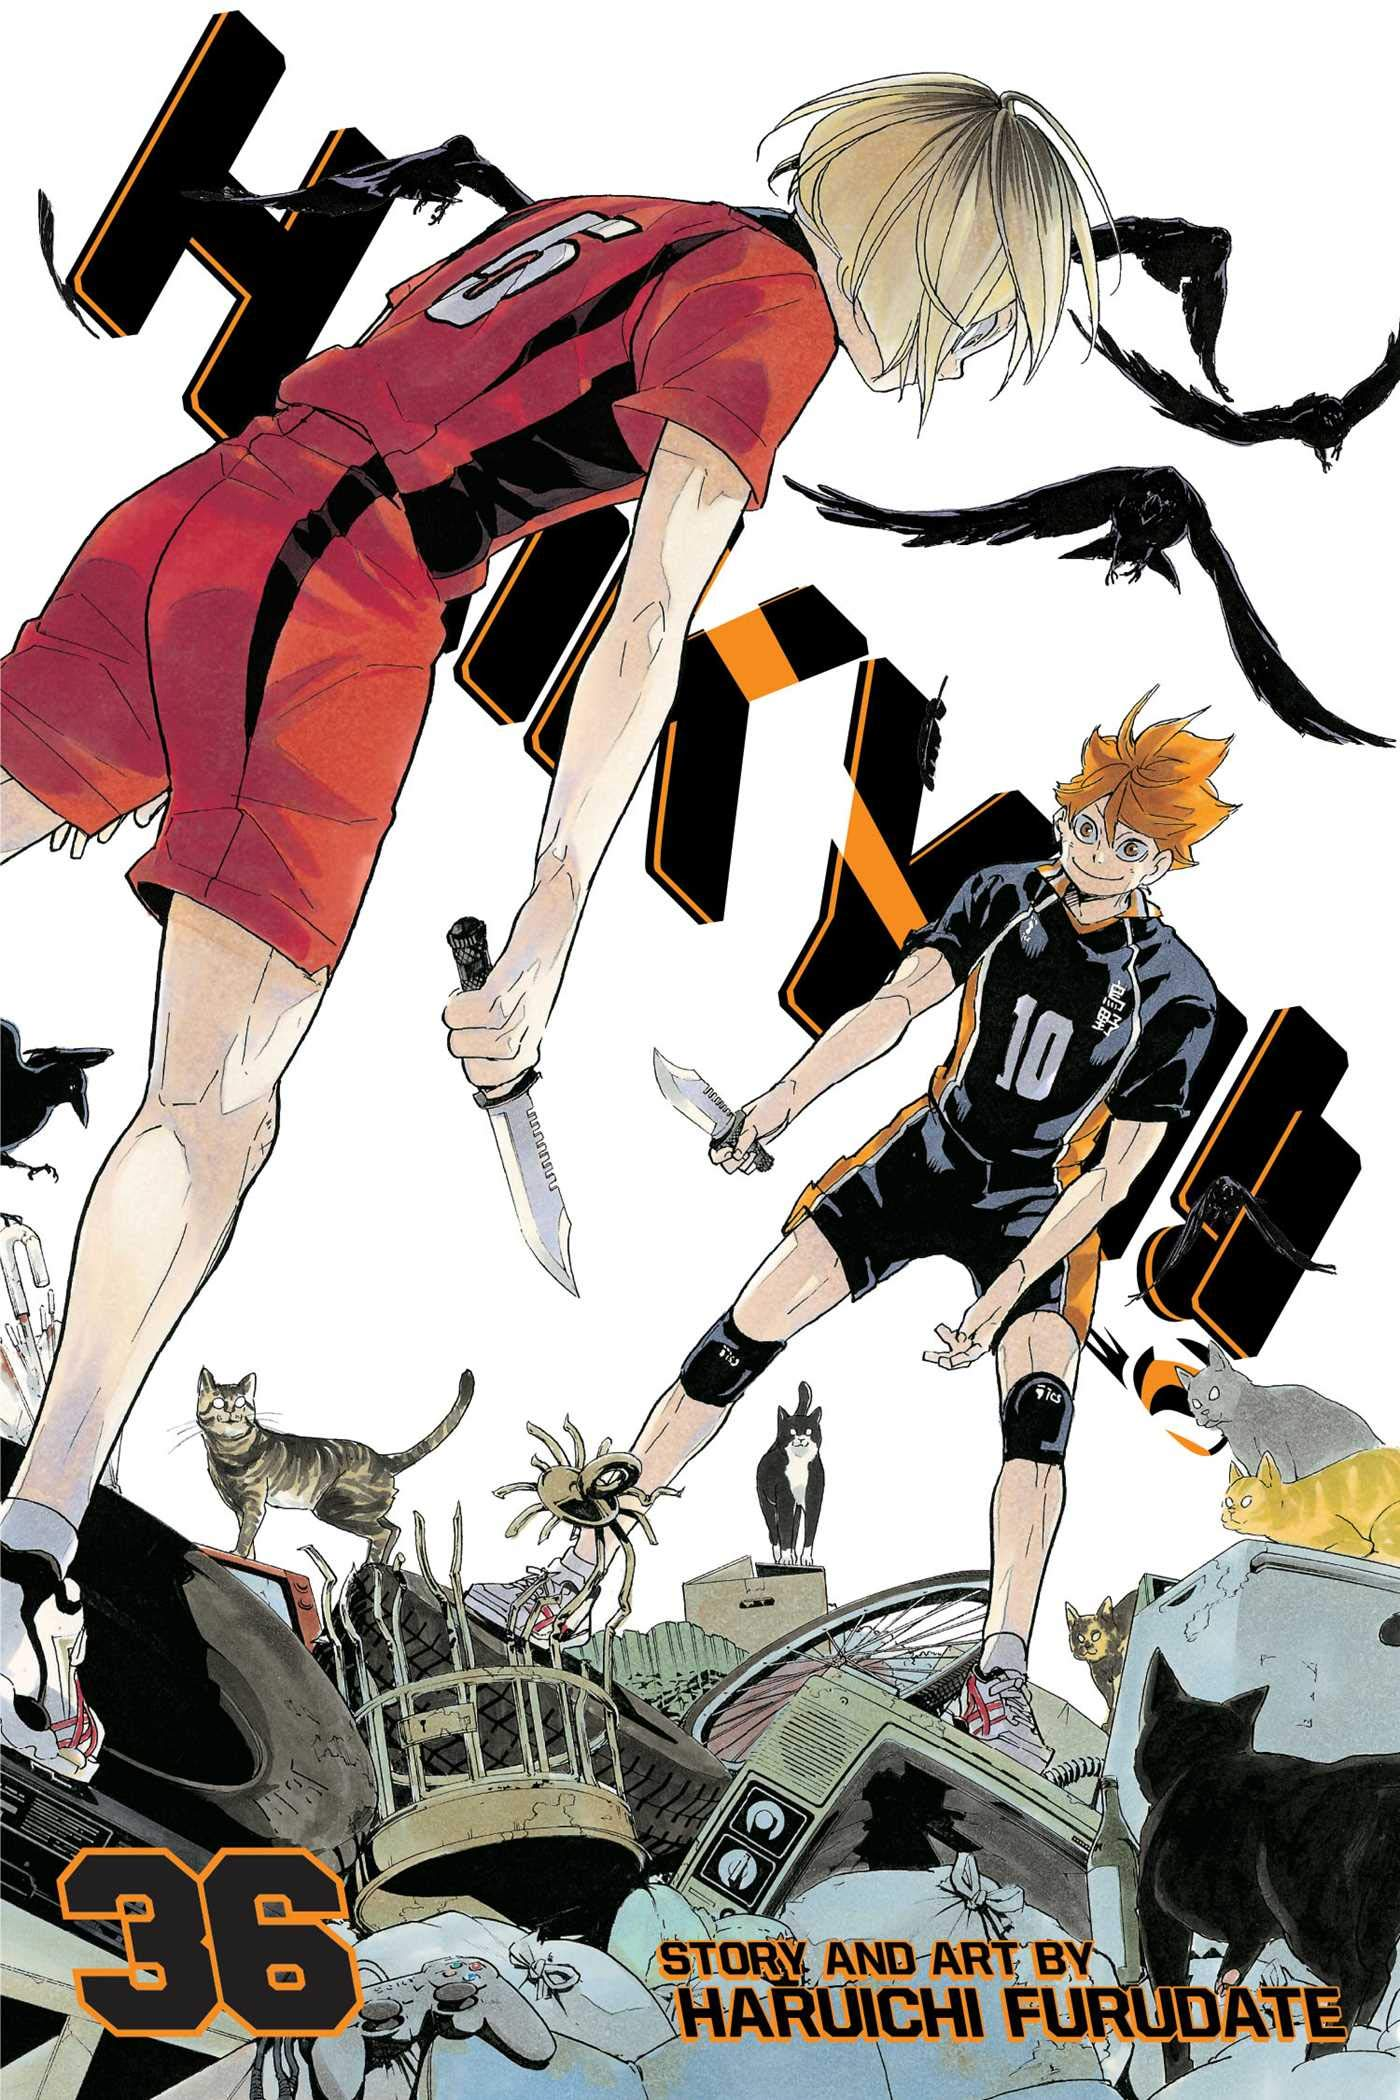 Haikyu!! - Tomo 36 - Haruichi Furudate - Manga ( Ingles)